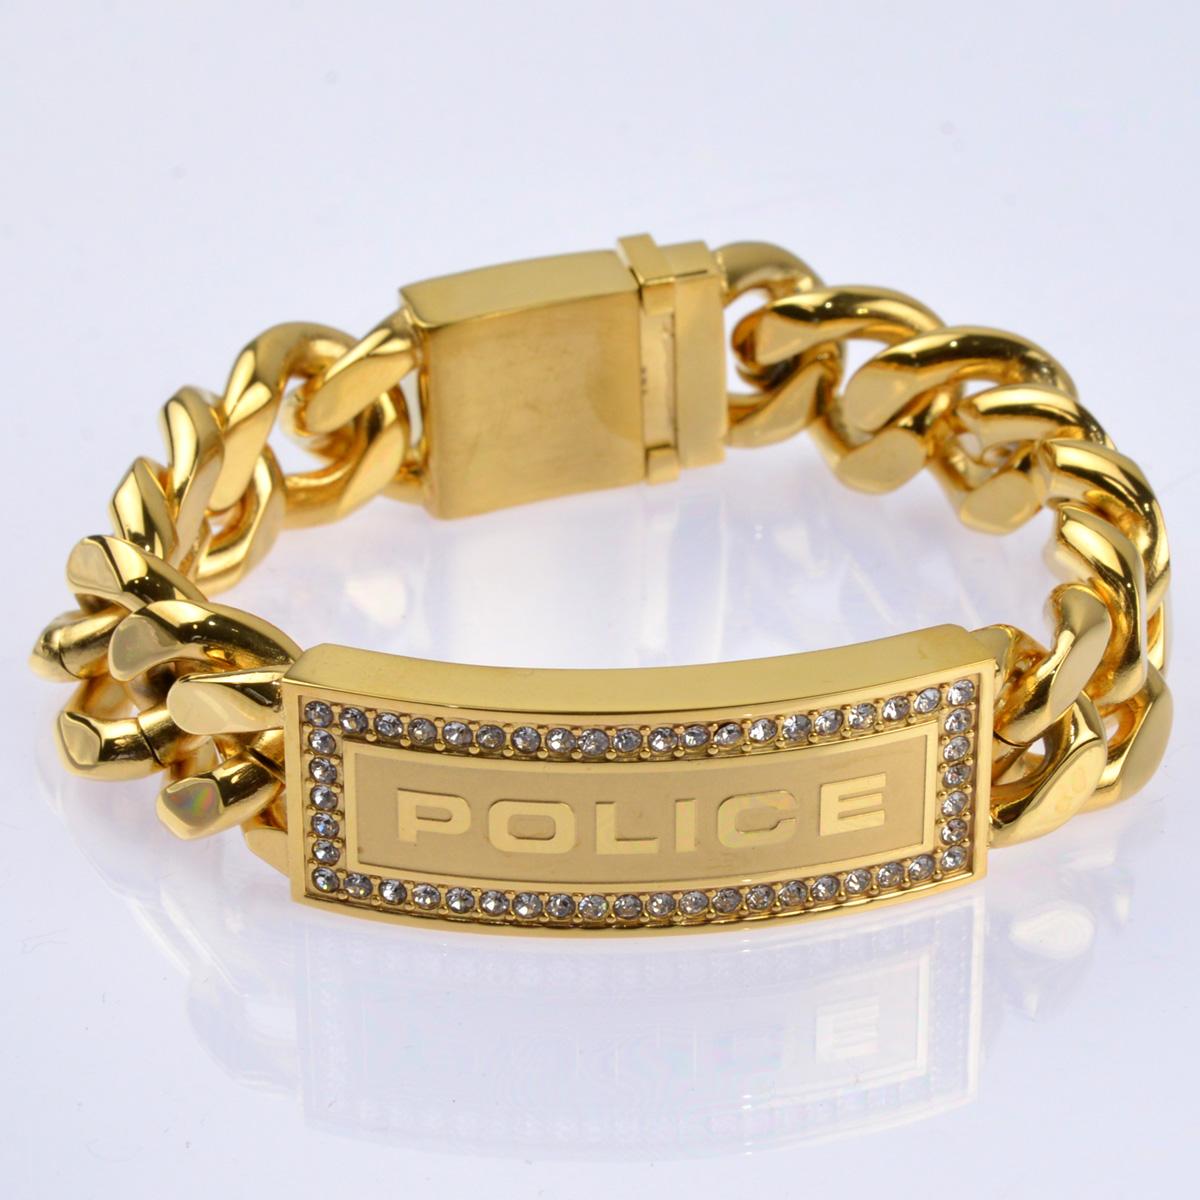 http://www.police.ne.jp/images/police-bracelet-lowrig-01.jpg